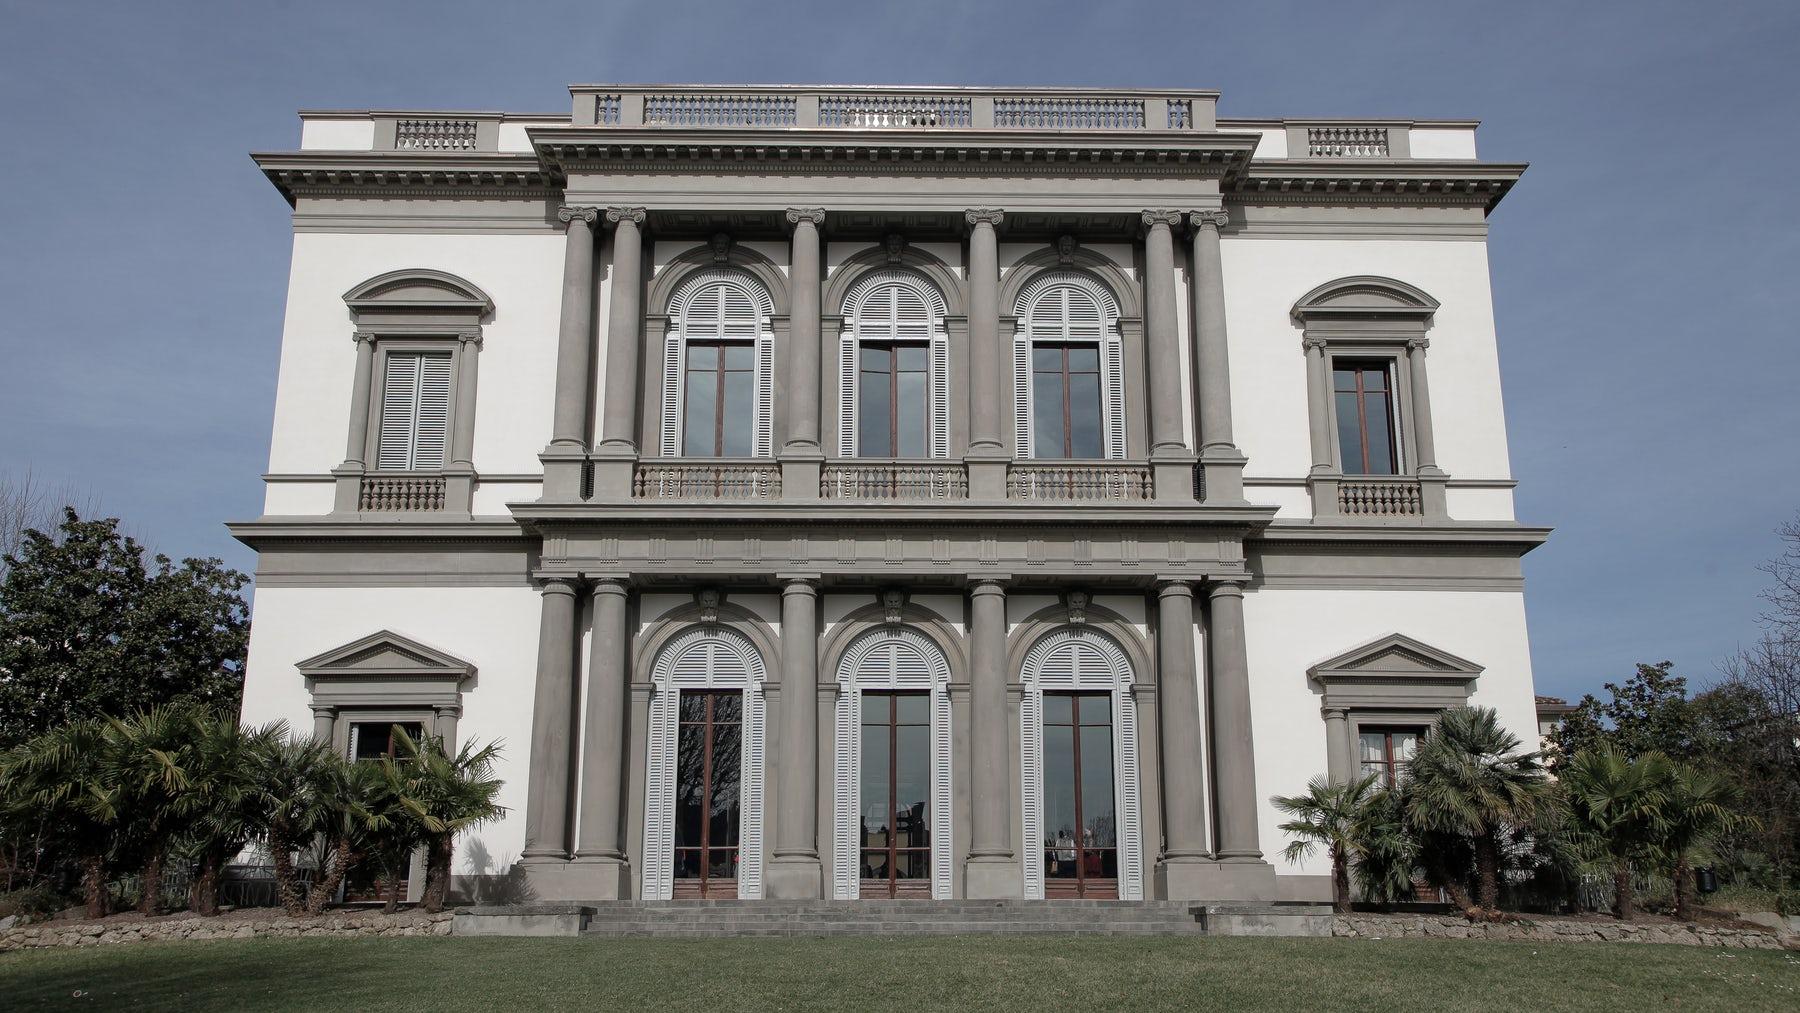 Polimoda headquarters in Villa Favard in Florence, Italy | Source: Courtesy